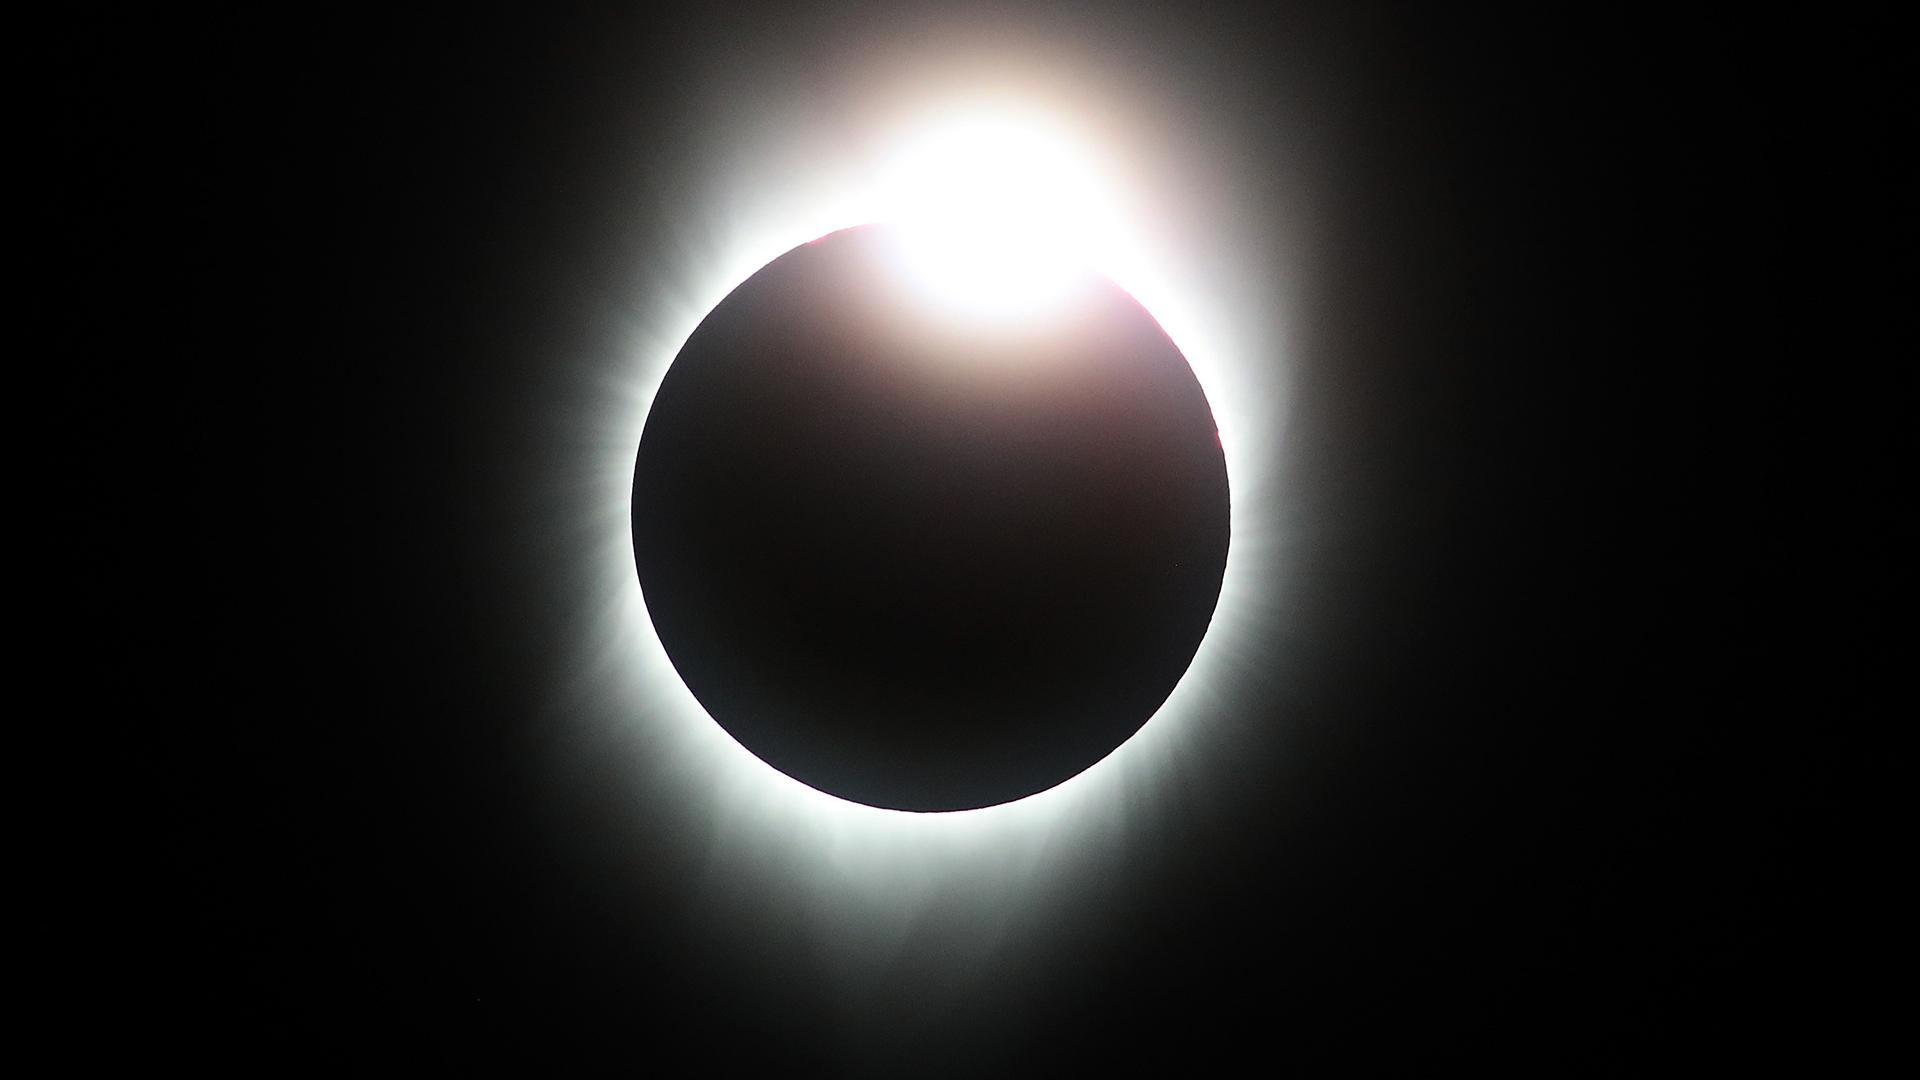 Watching solar eclipse Diamond Ring-159532.jpg80544646